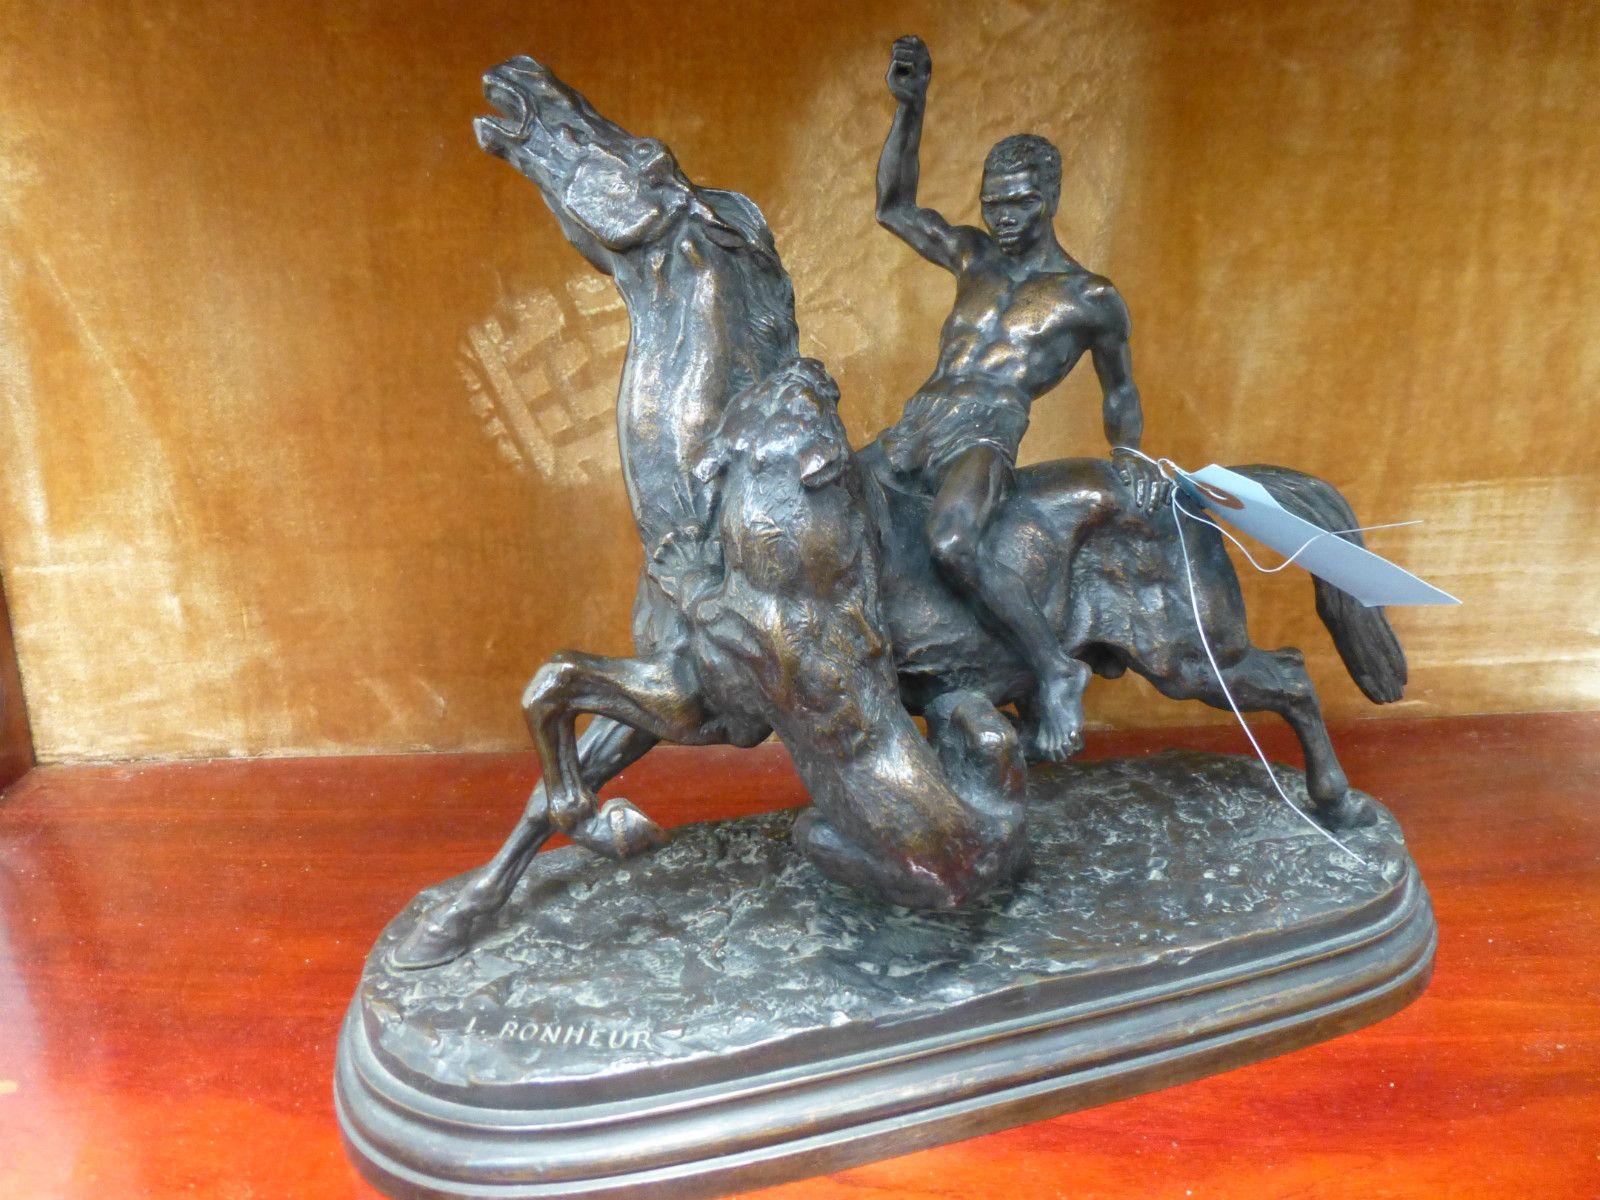 a bronze sculpture by I.Bonheur